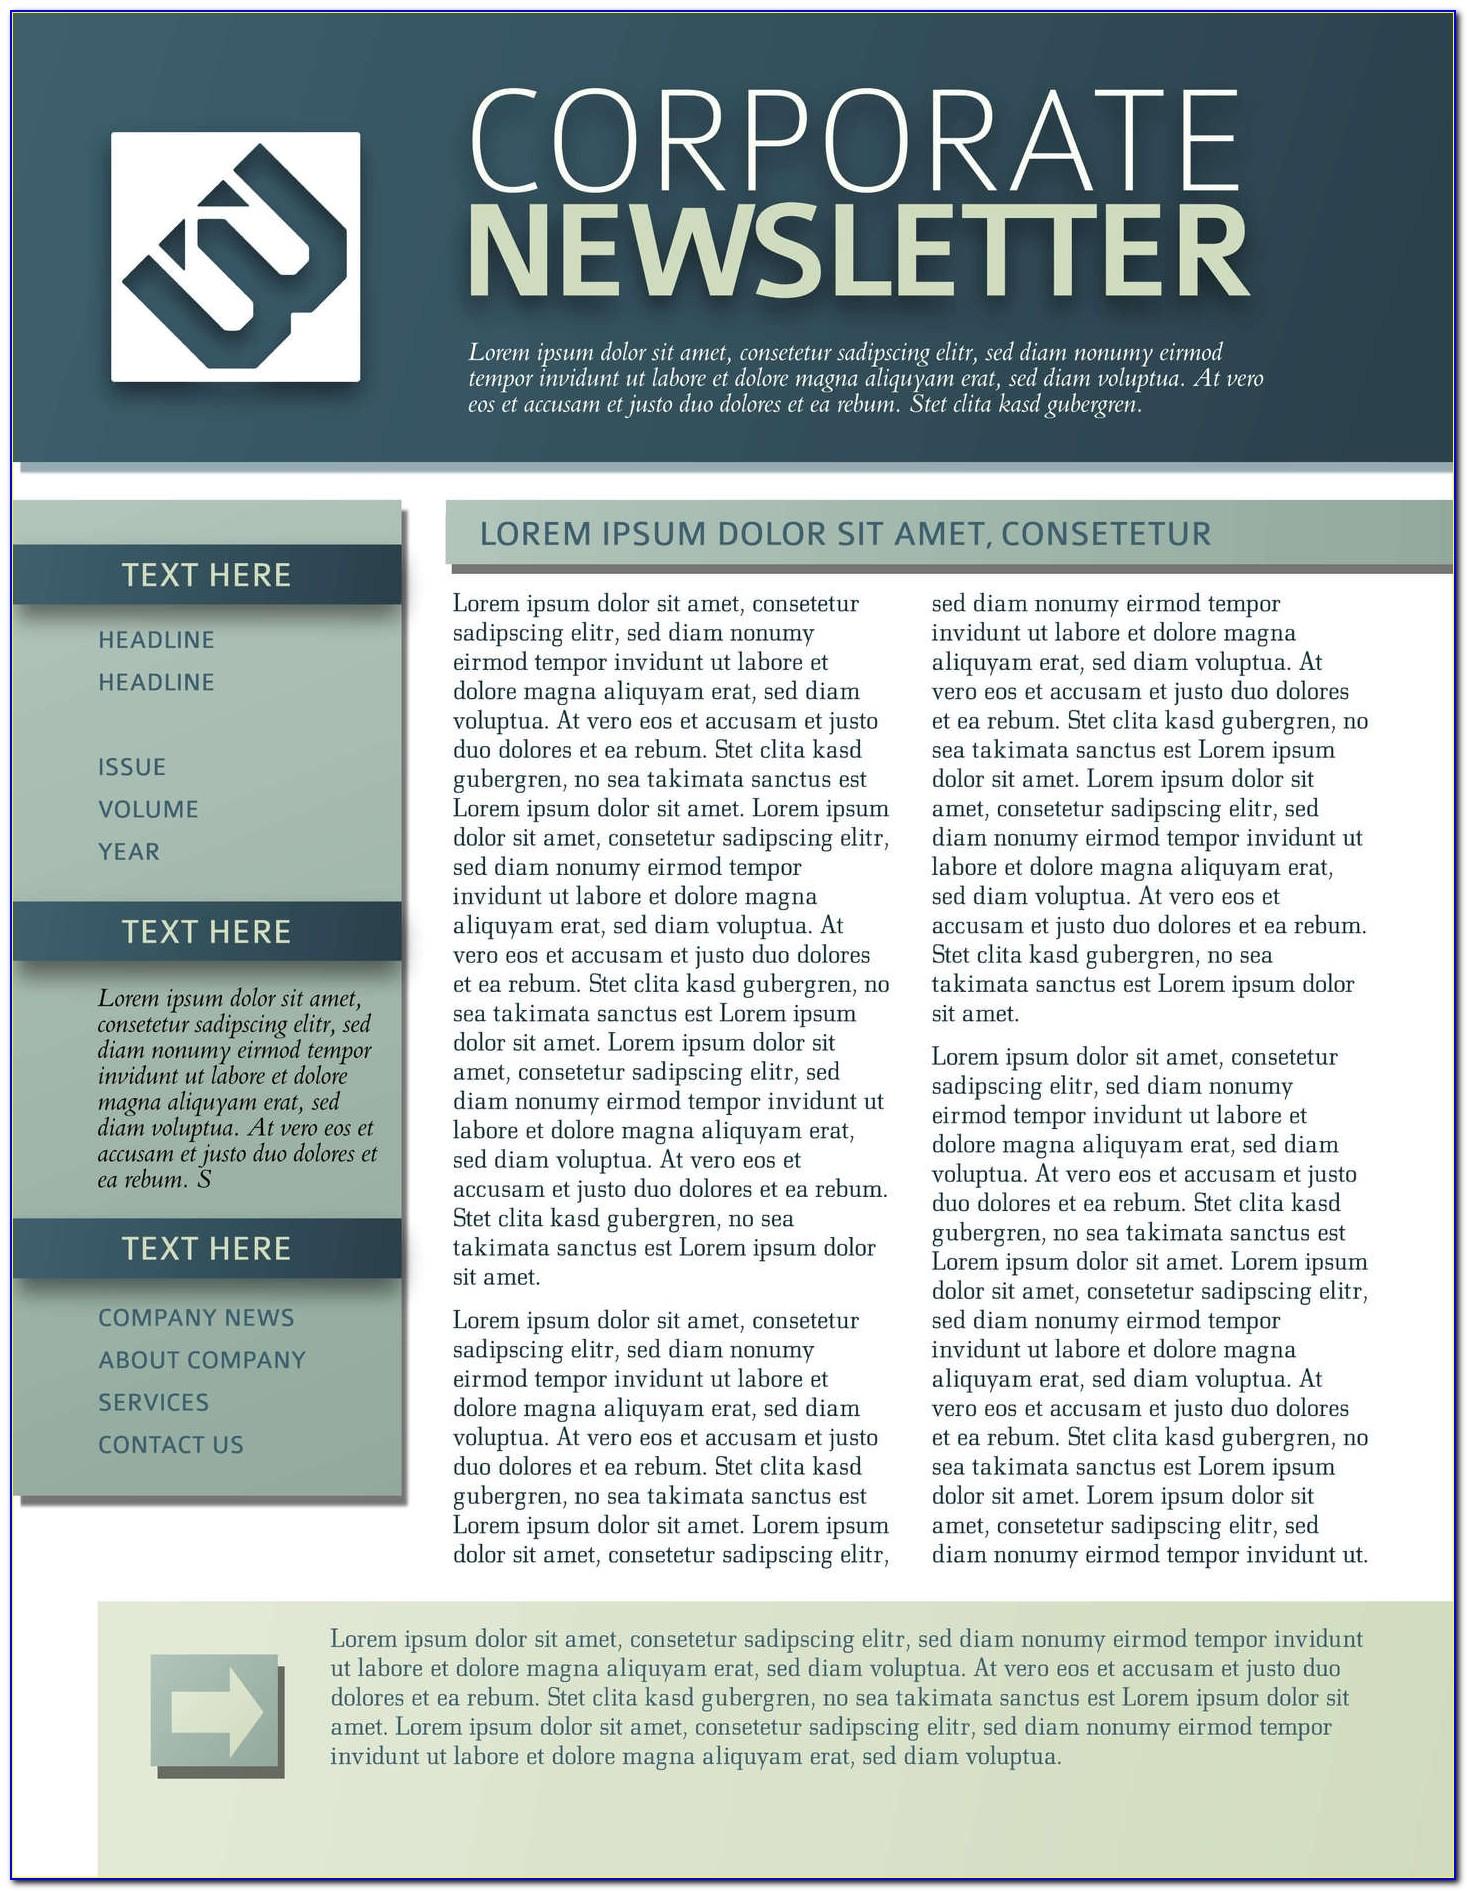 Corporate Newsletter Templates Pdf